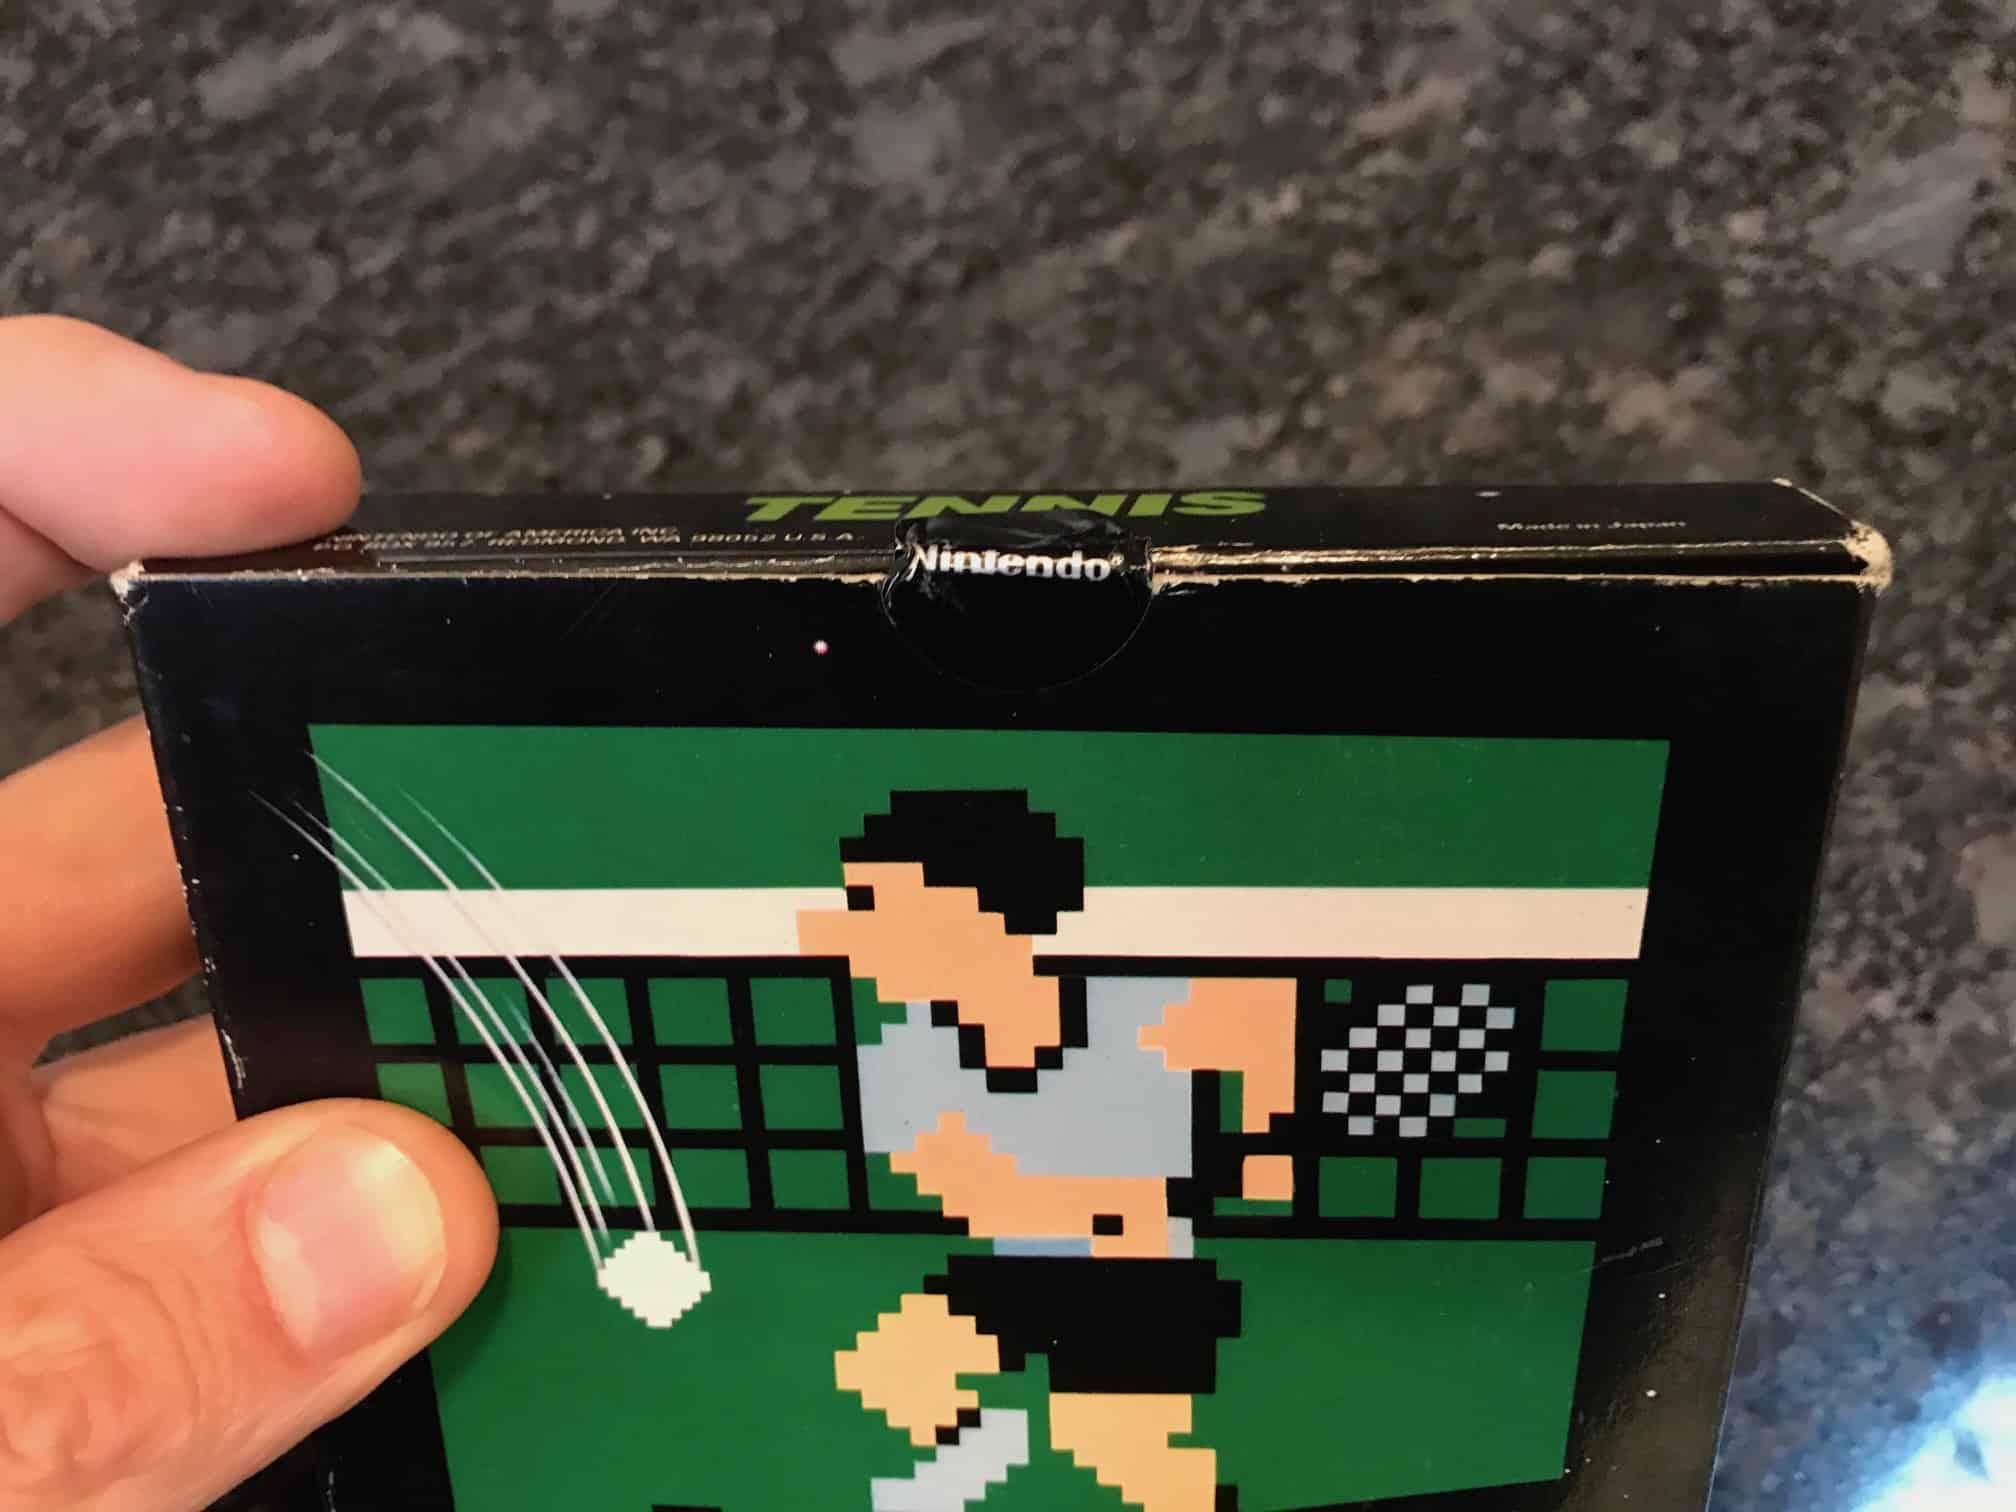 Nintendo gloss Sticker Seal black box game Tennis